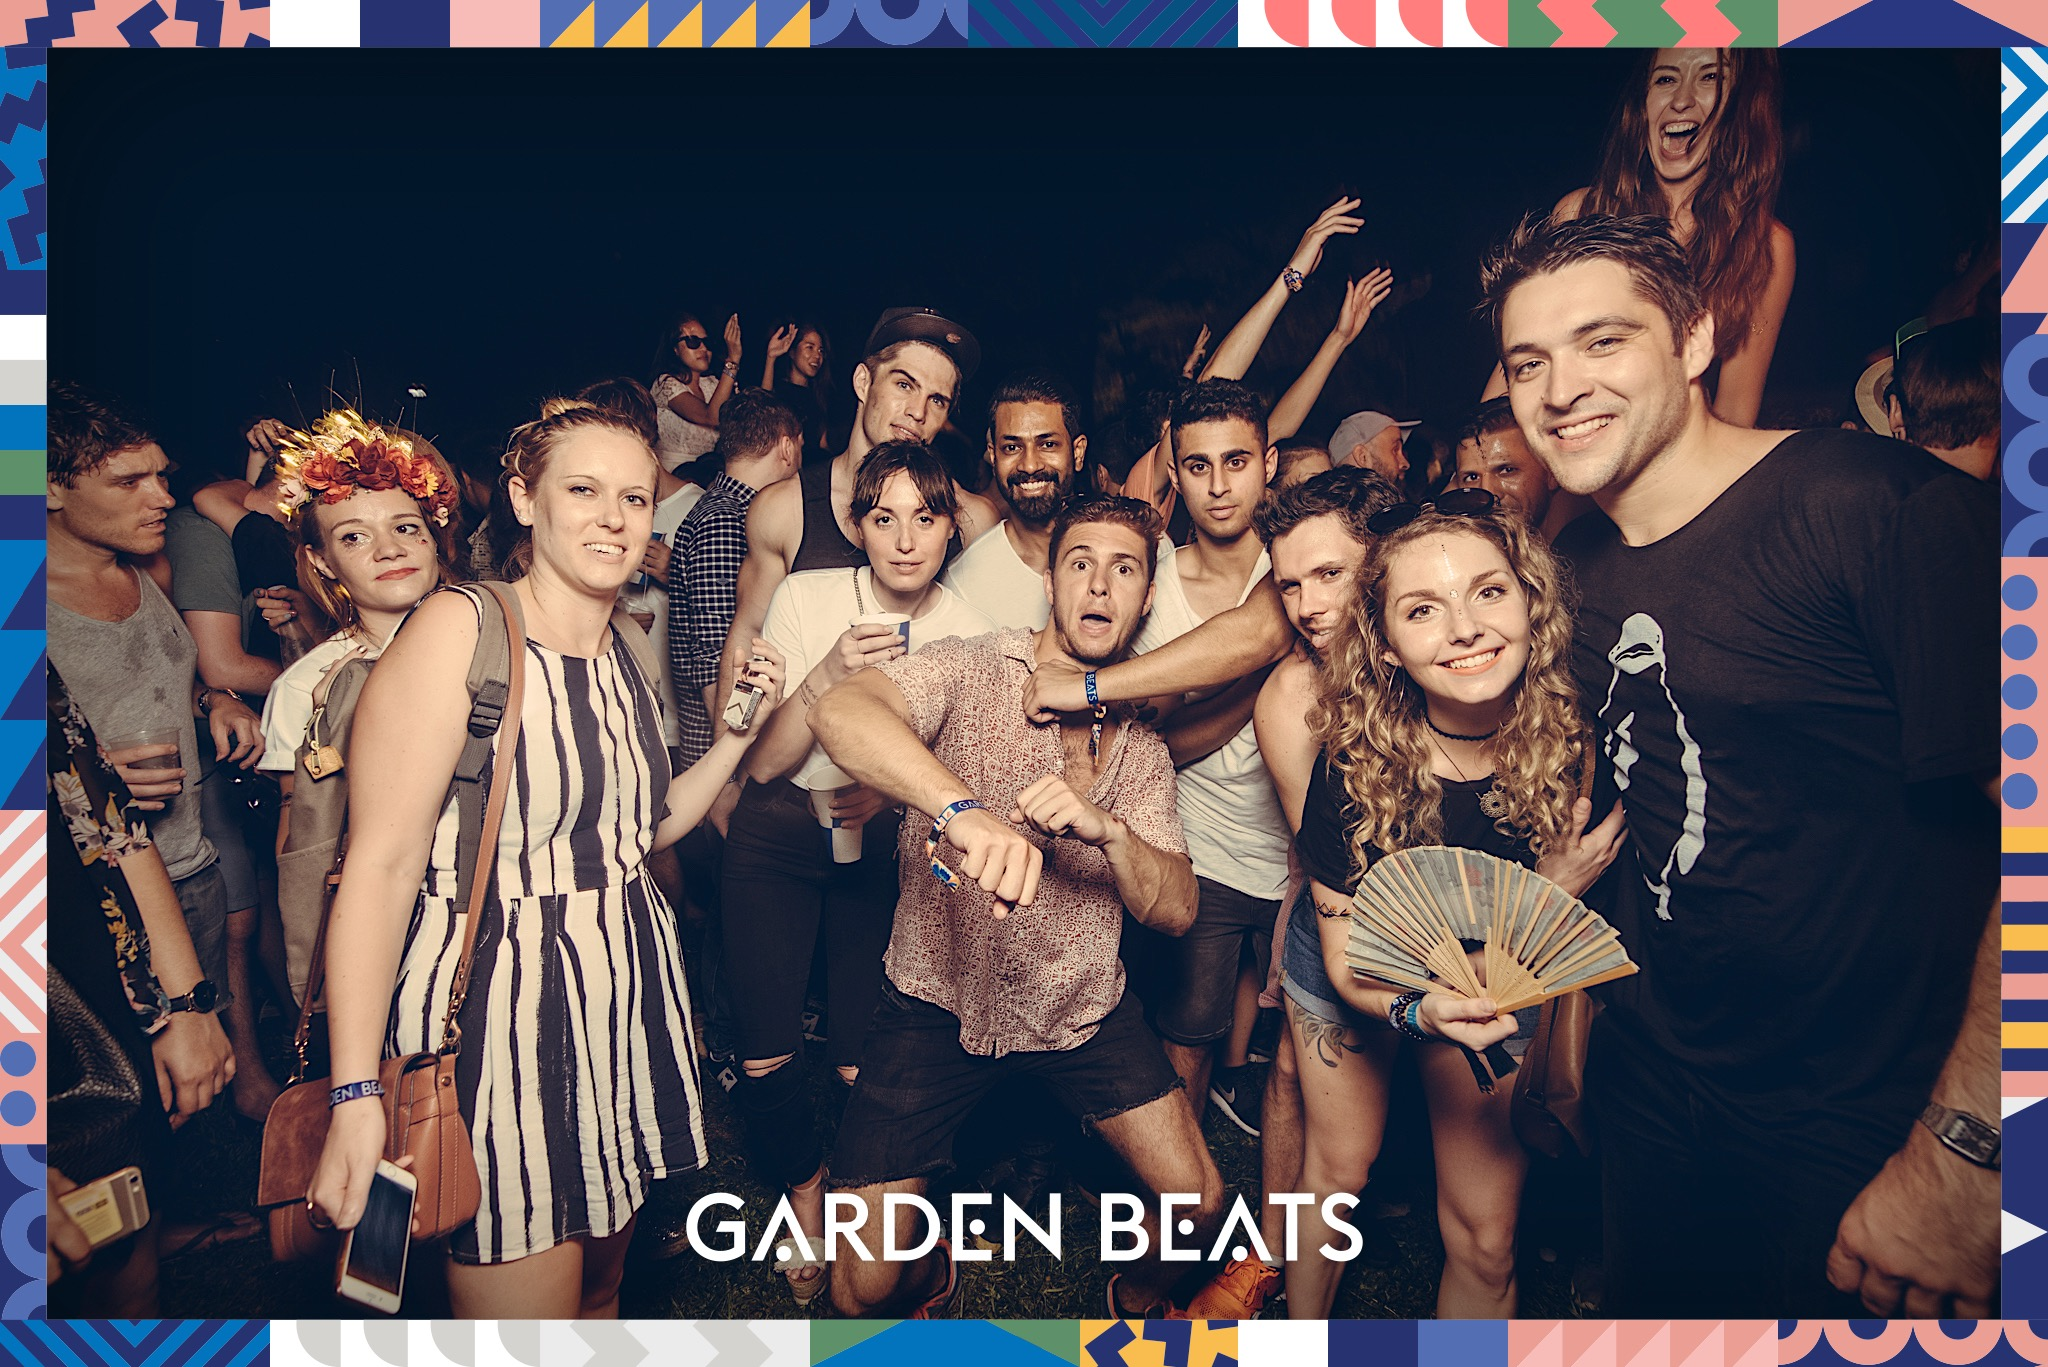 18032017_GardenBeats_Colossal798_WatermarkedGB.jpg